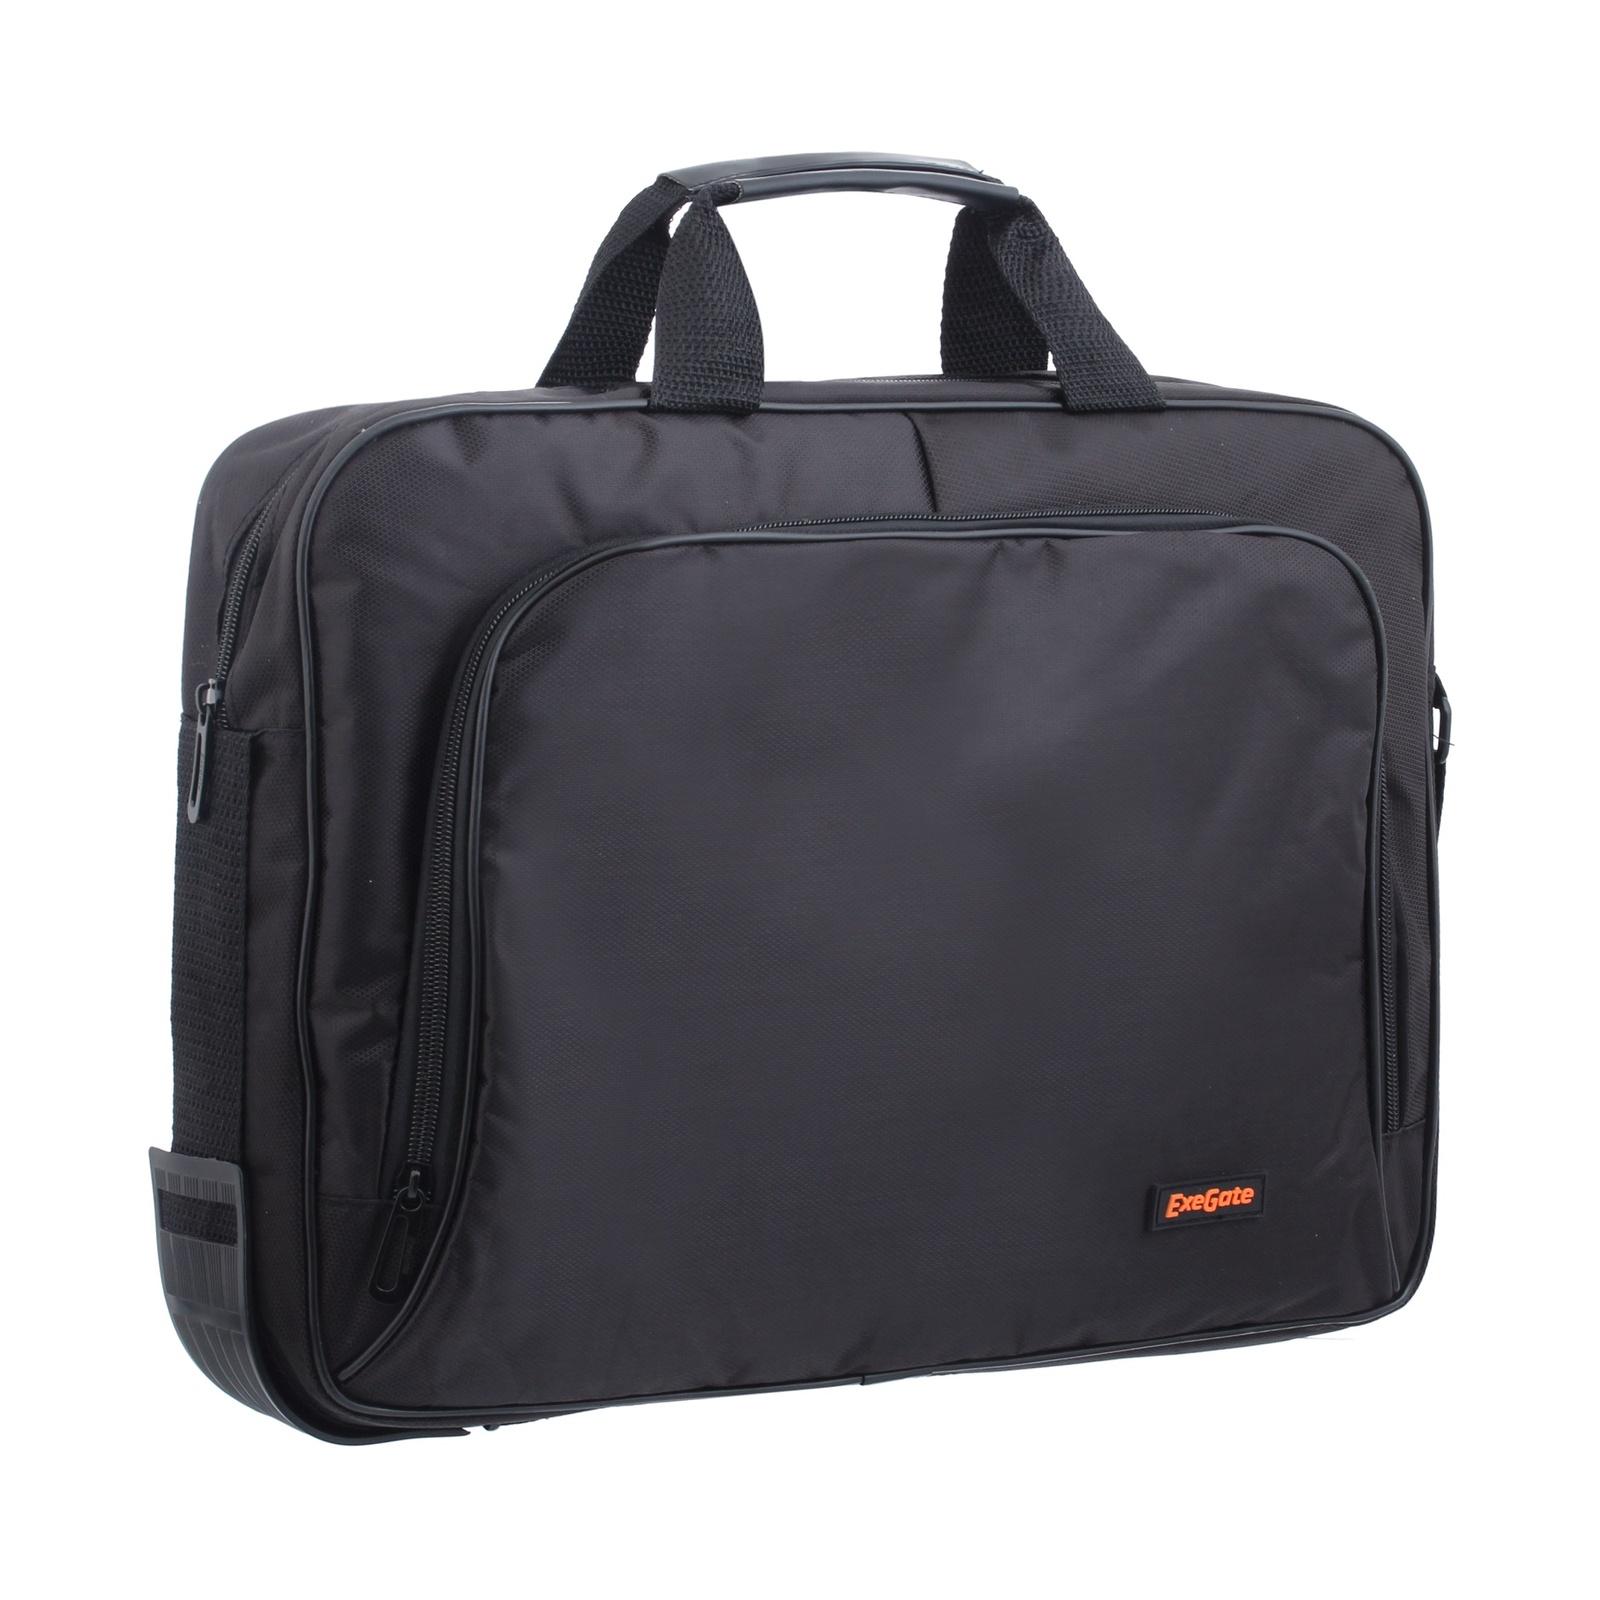 Сумка Exegate Office F1596 Black, черная, полиэстер, для ноутбуков до 15.6 аксессуар сумка 15 6 exegate office f1595 black